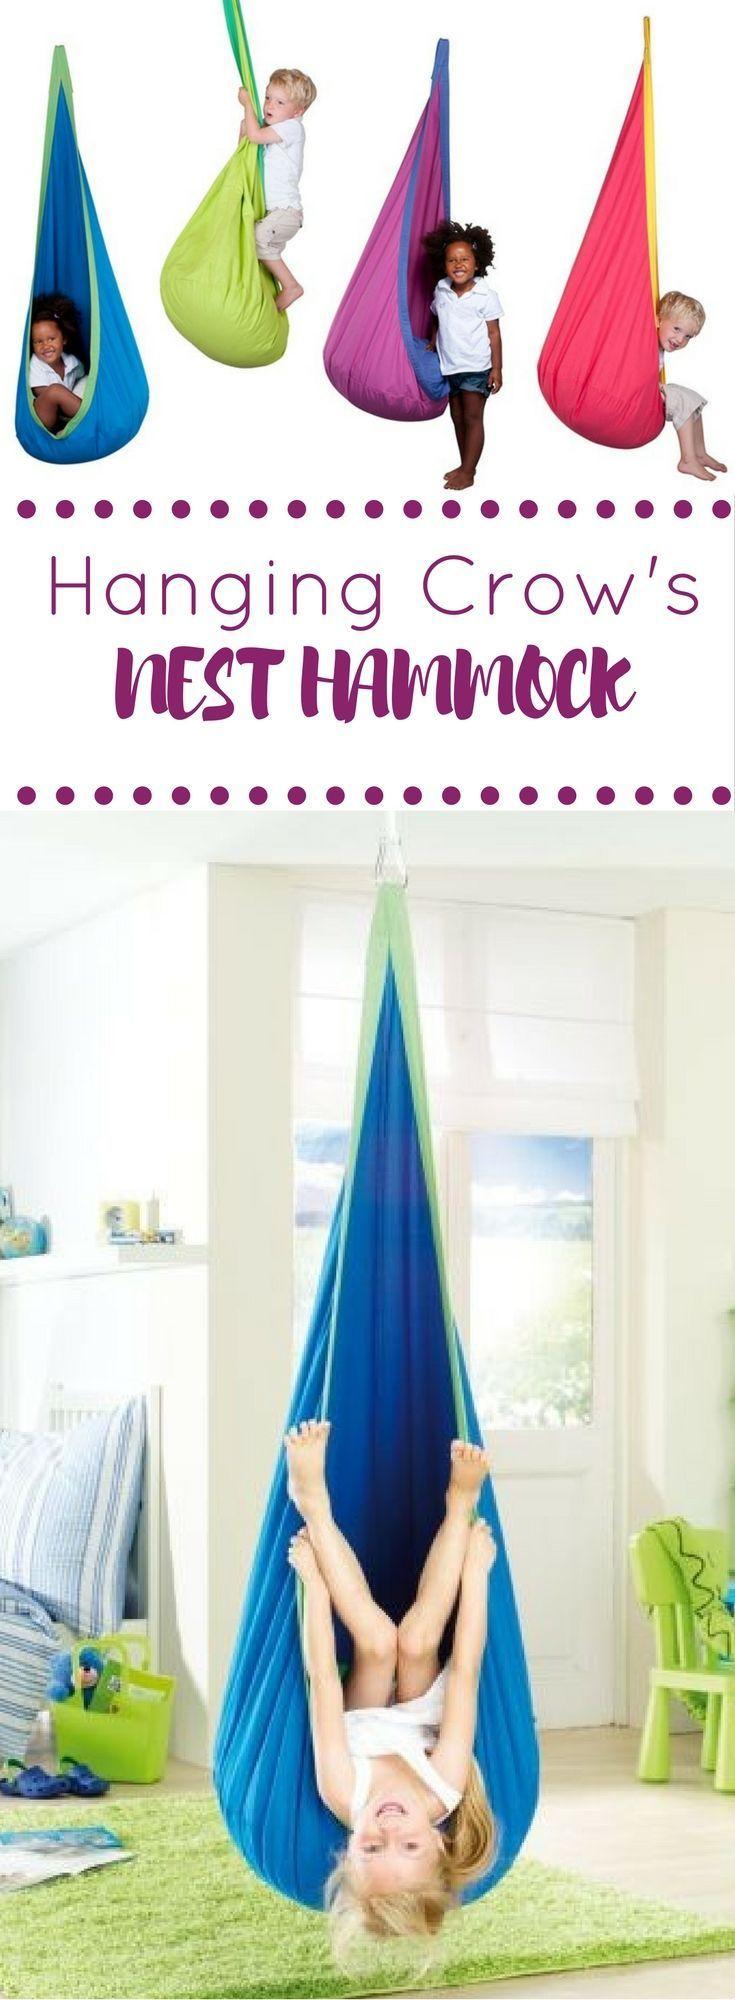 Hanging crowus nest hammock for kids learningtoys for